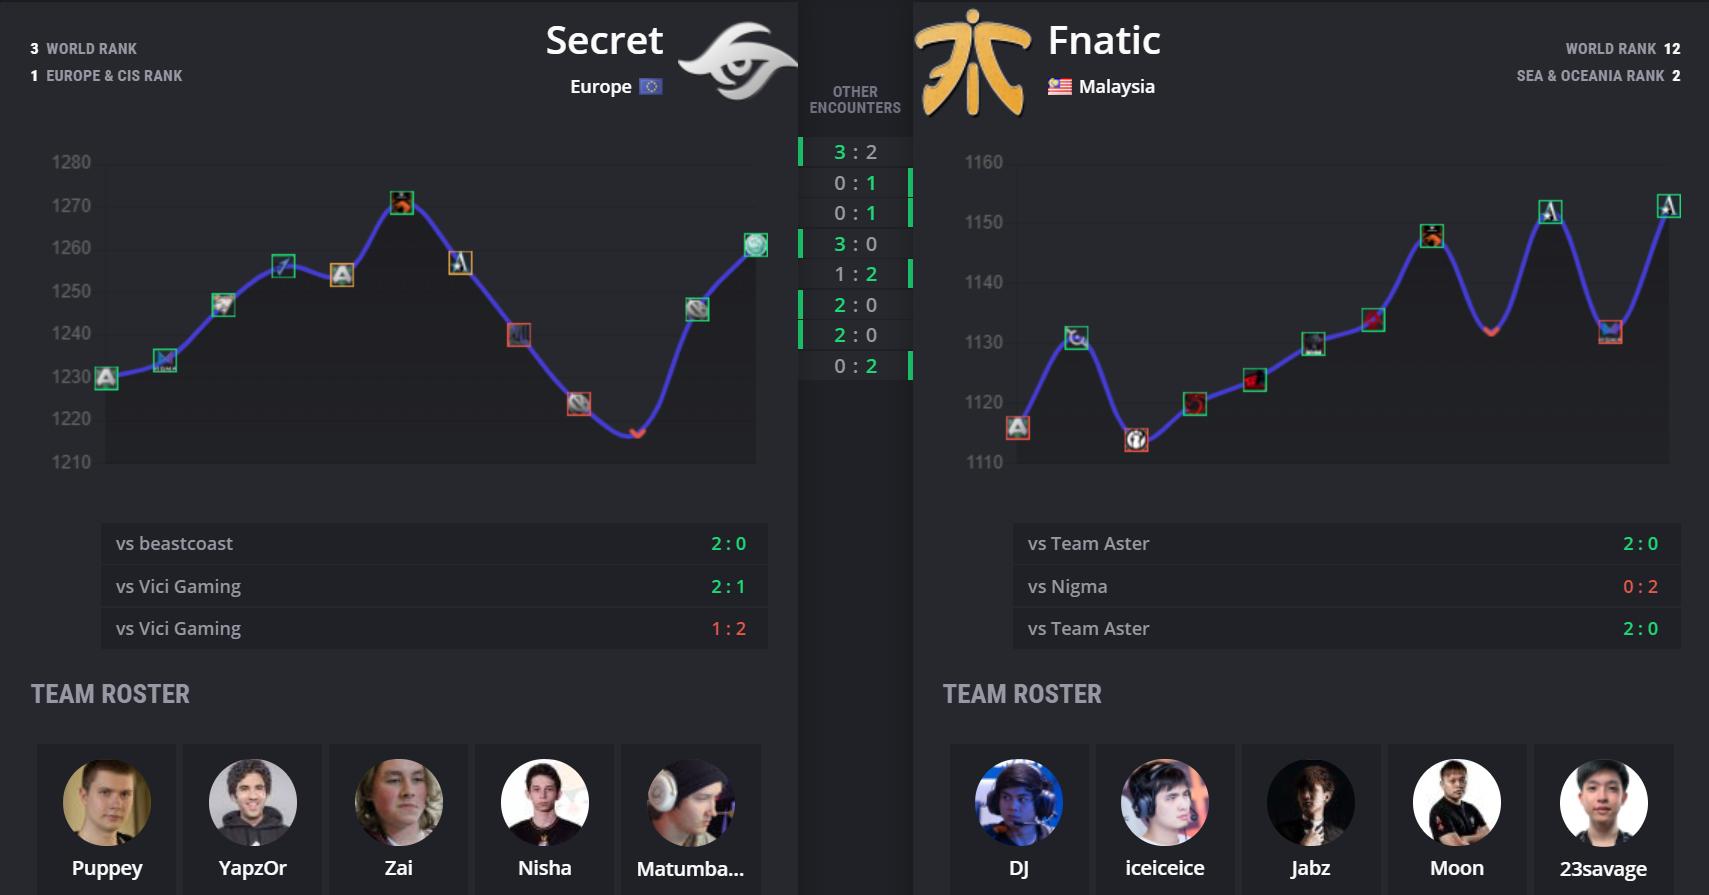 fnatic vs secret stats - Vòng playoff Leipzig Major: Secret vs Fnatic - Quá dễ cho Puppey?